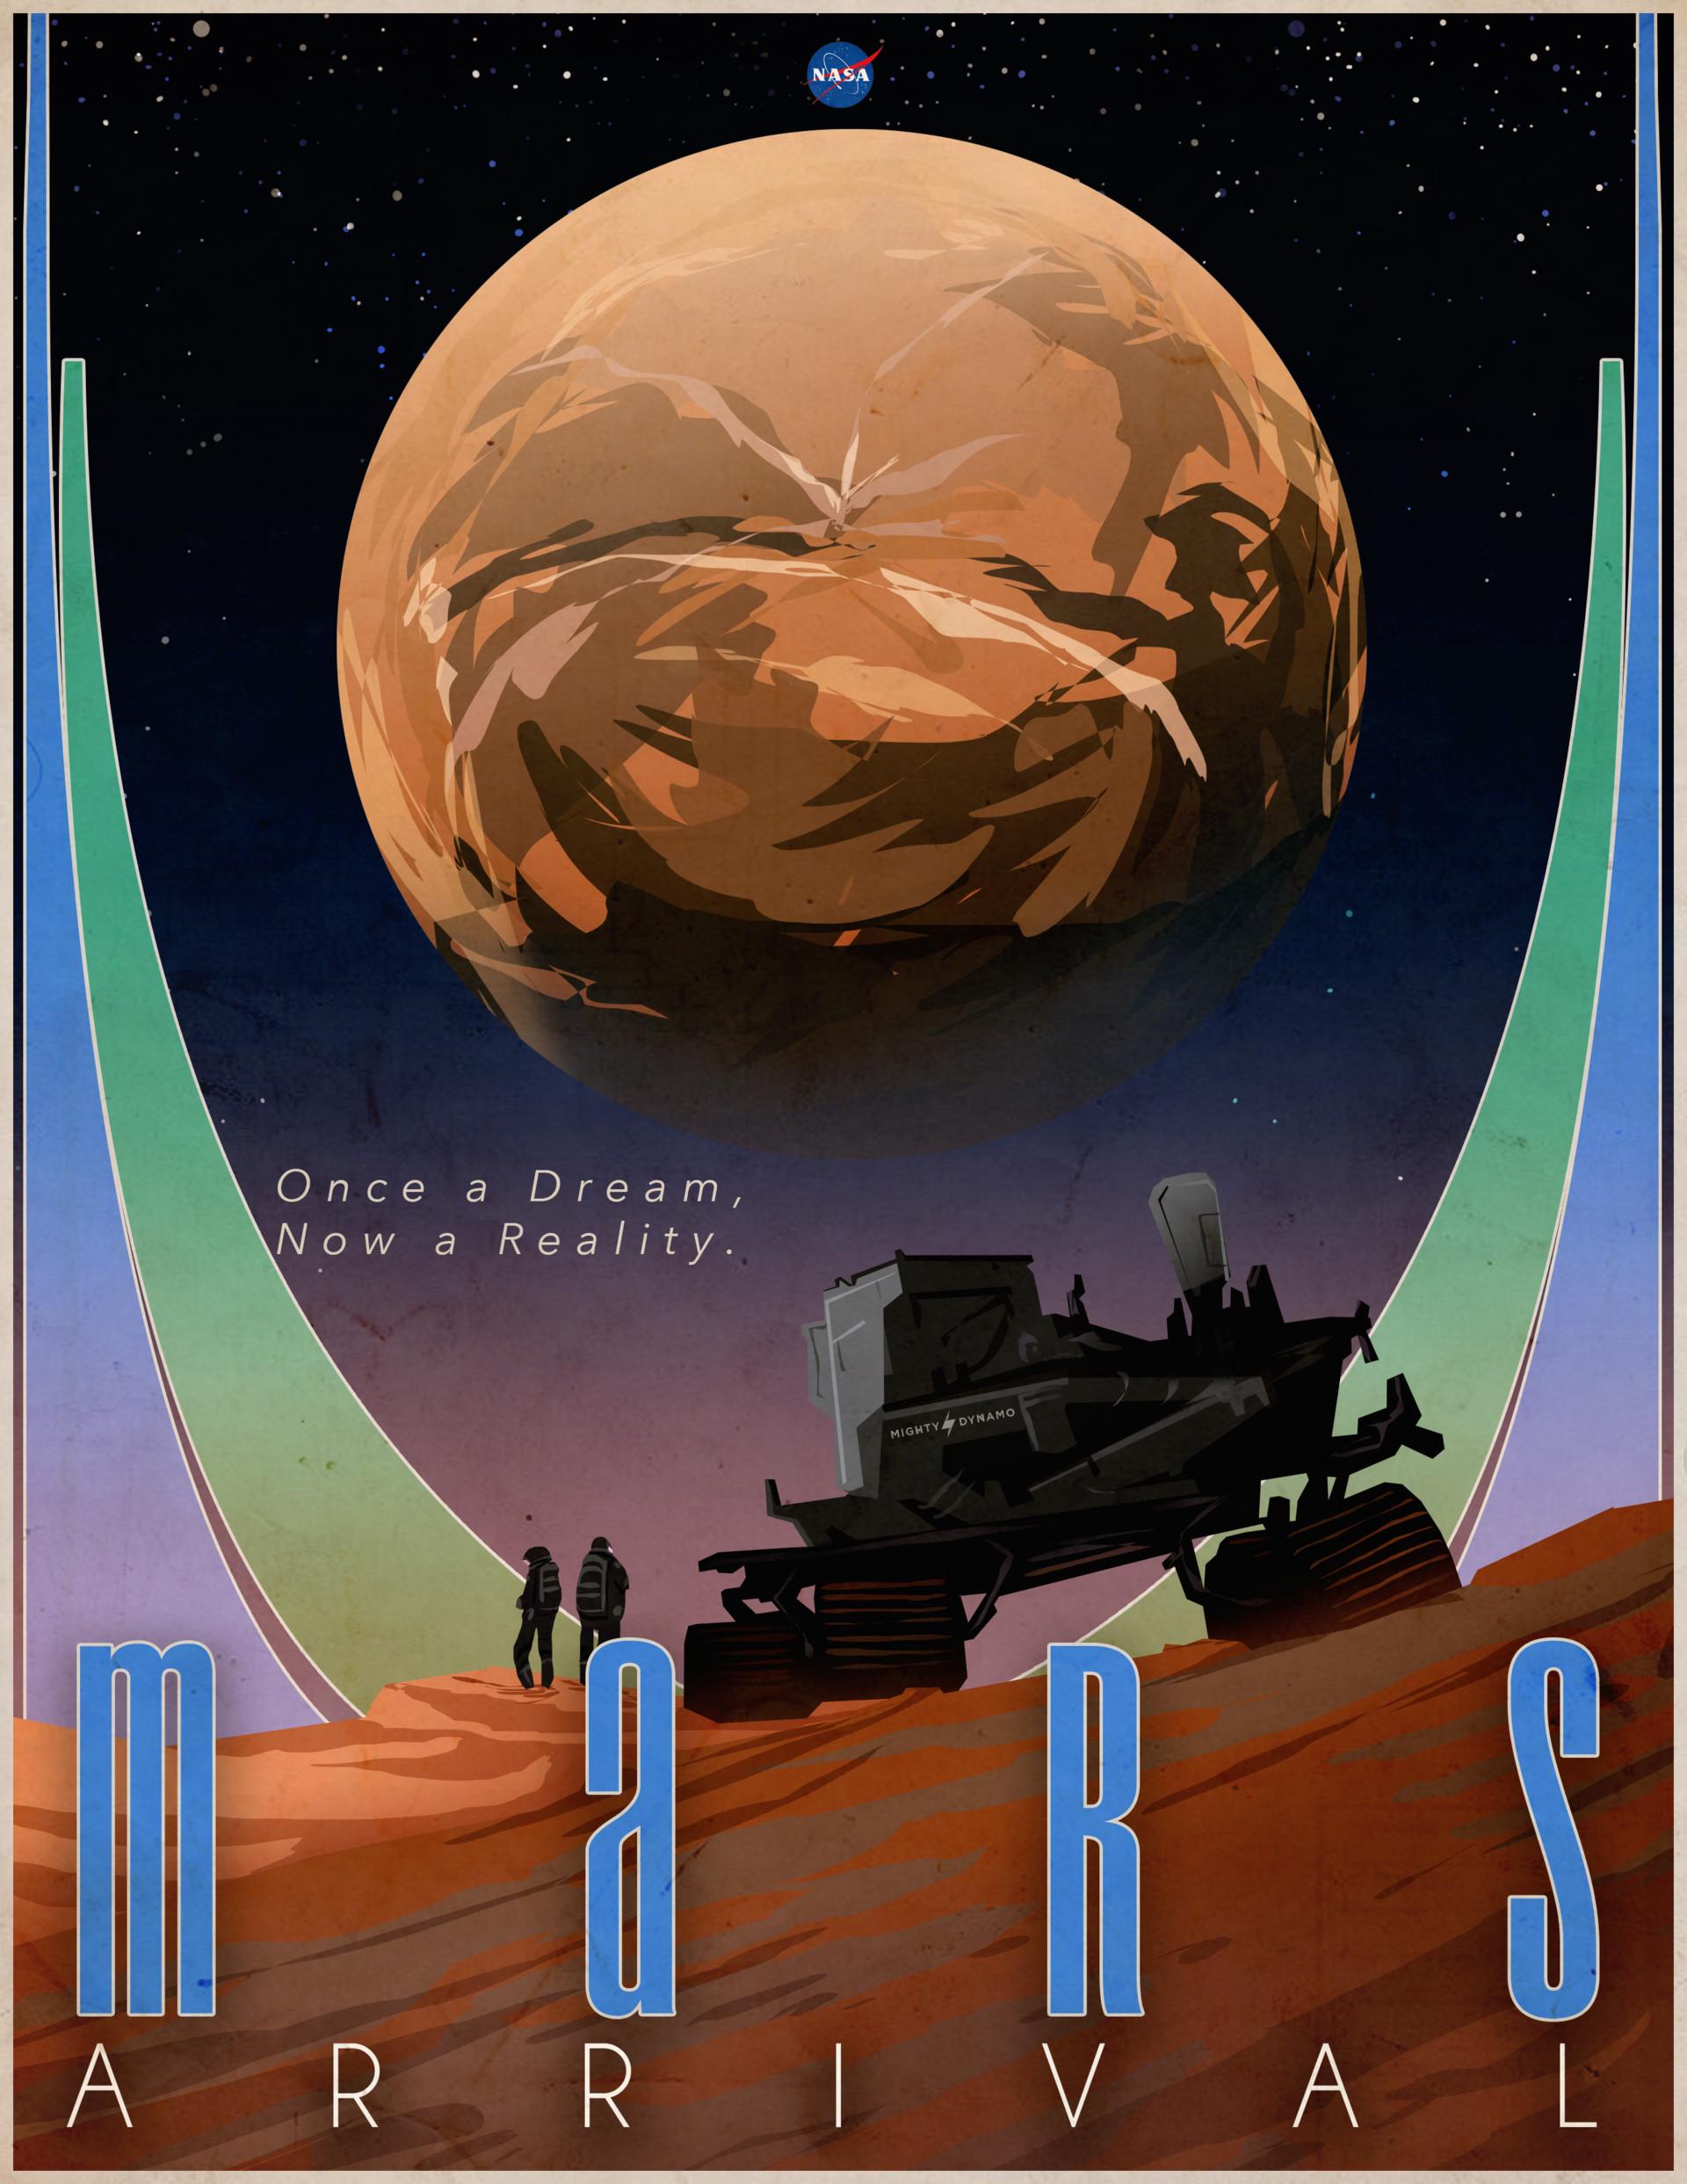 Meta olympia mars arrivals poster